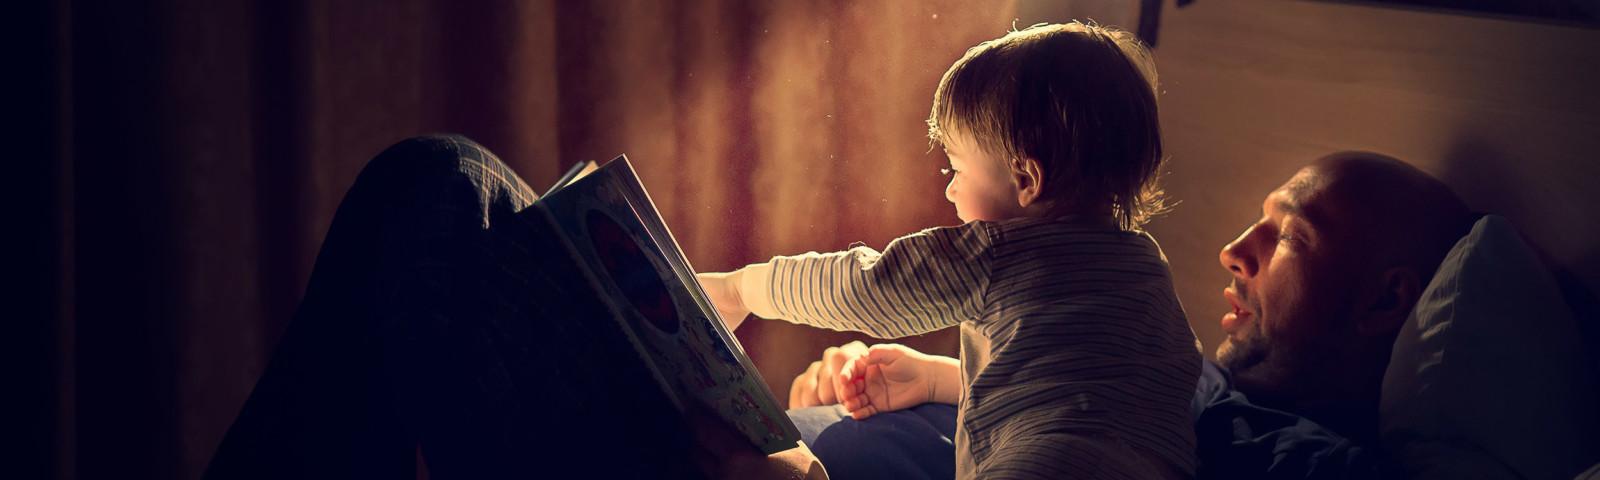 Kid Reading Book